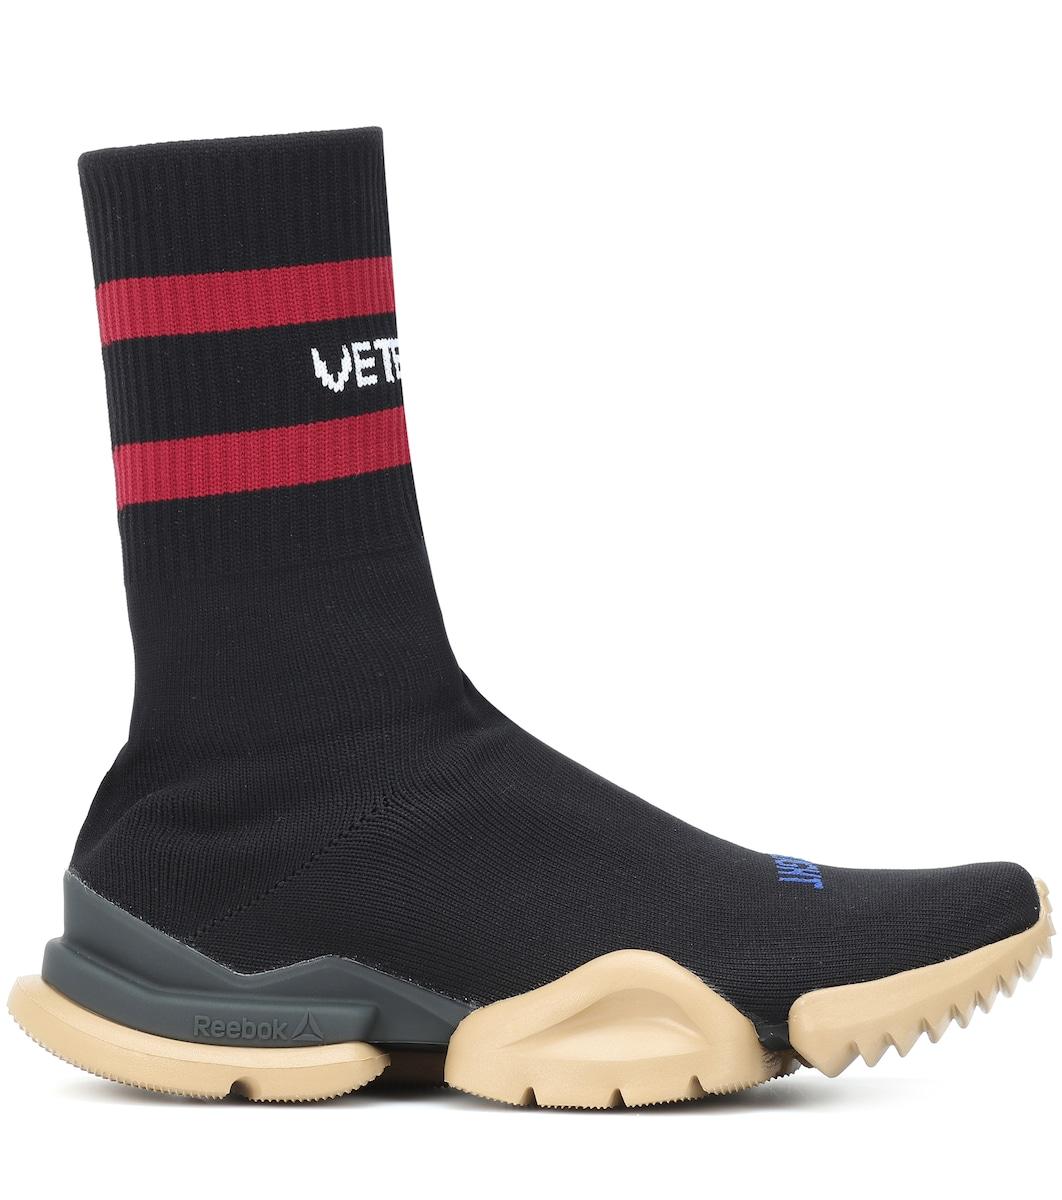 X Reebok Classic Sock Sneakers Vetements |